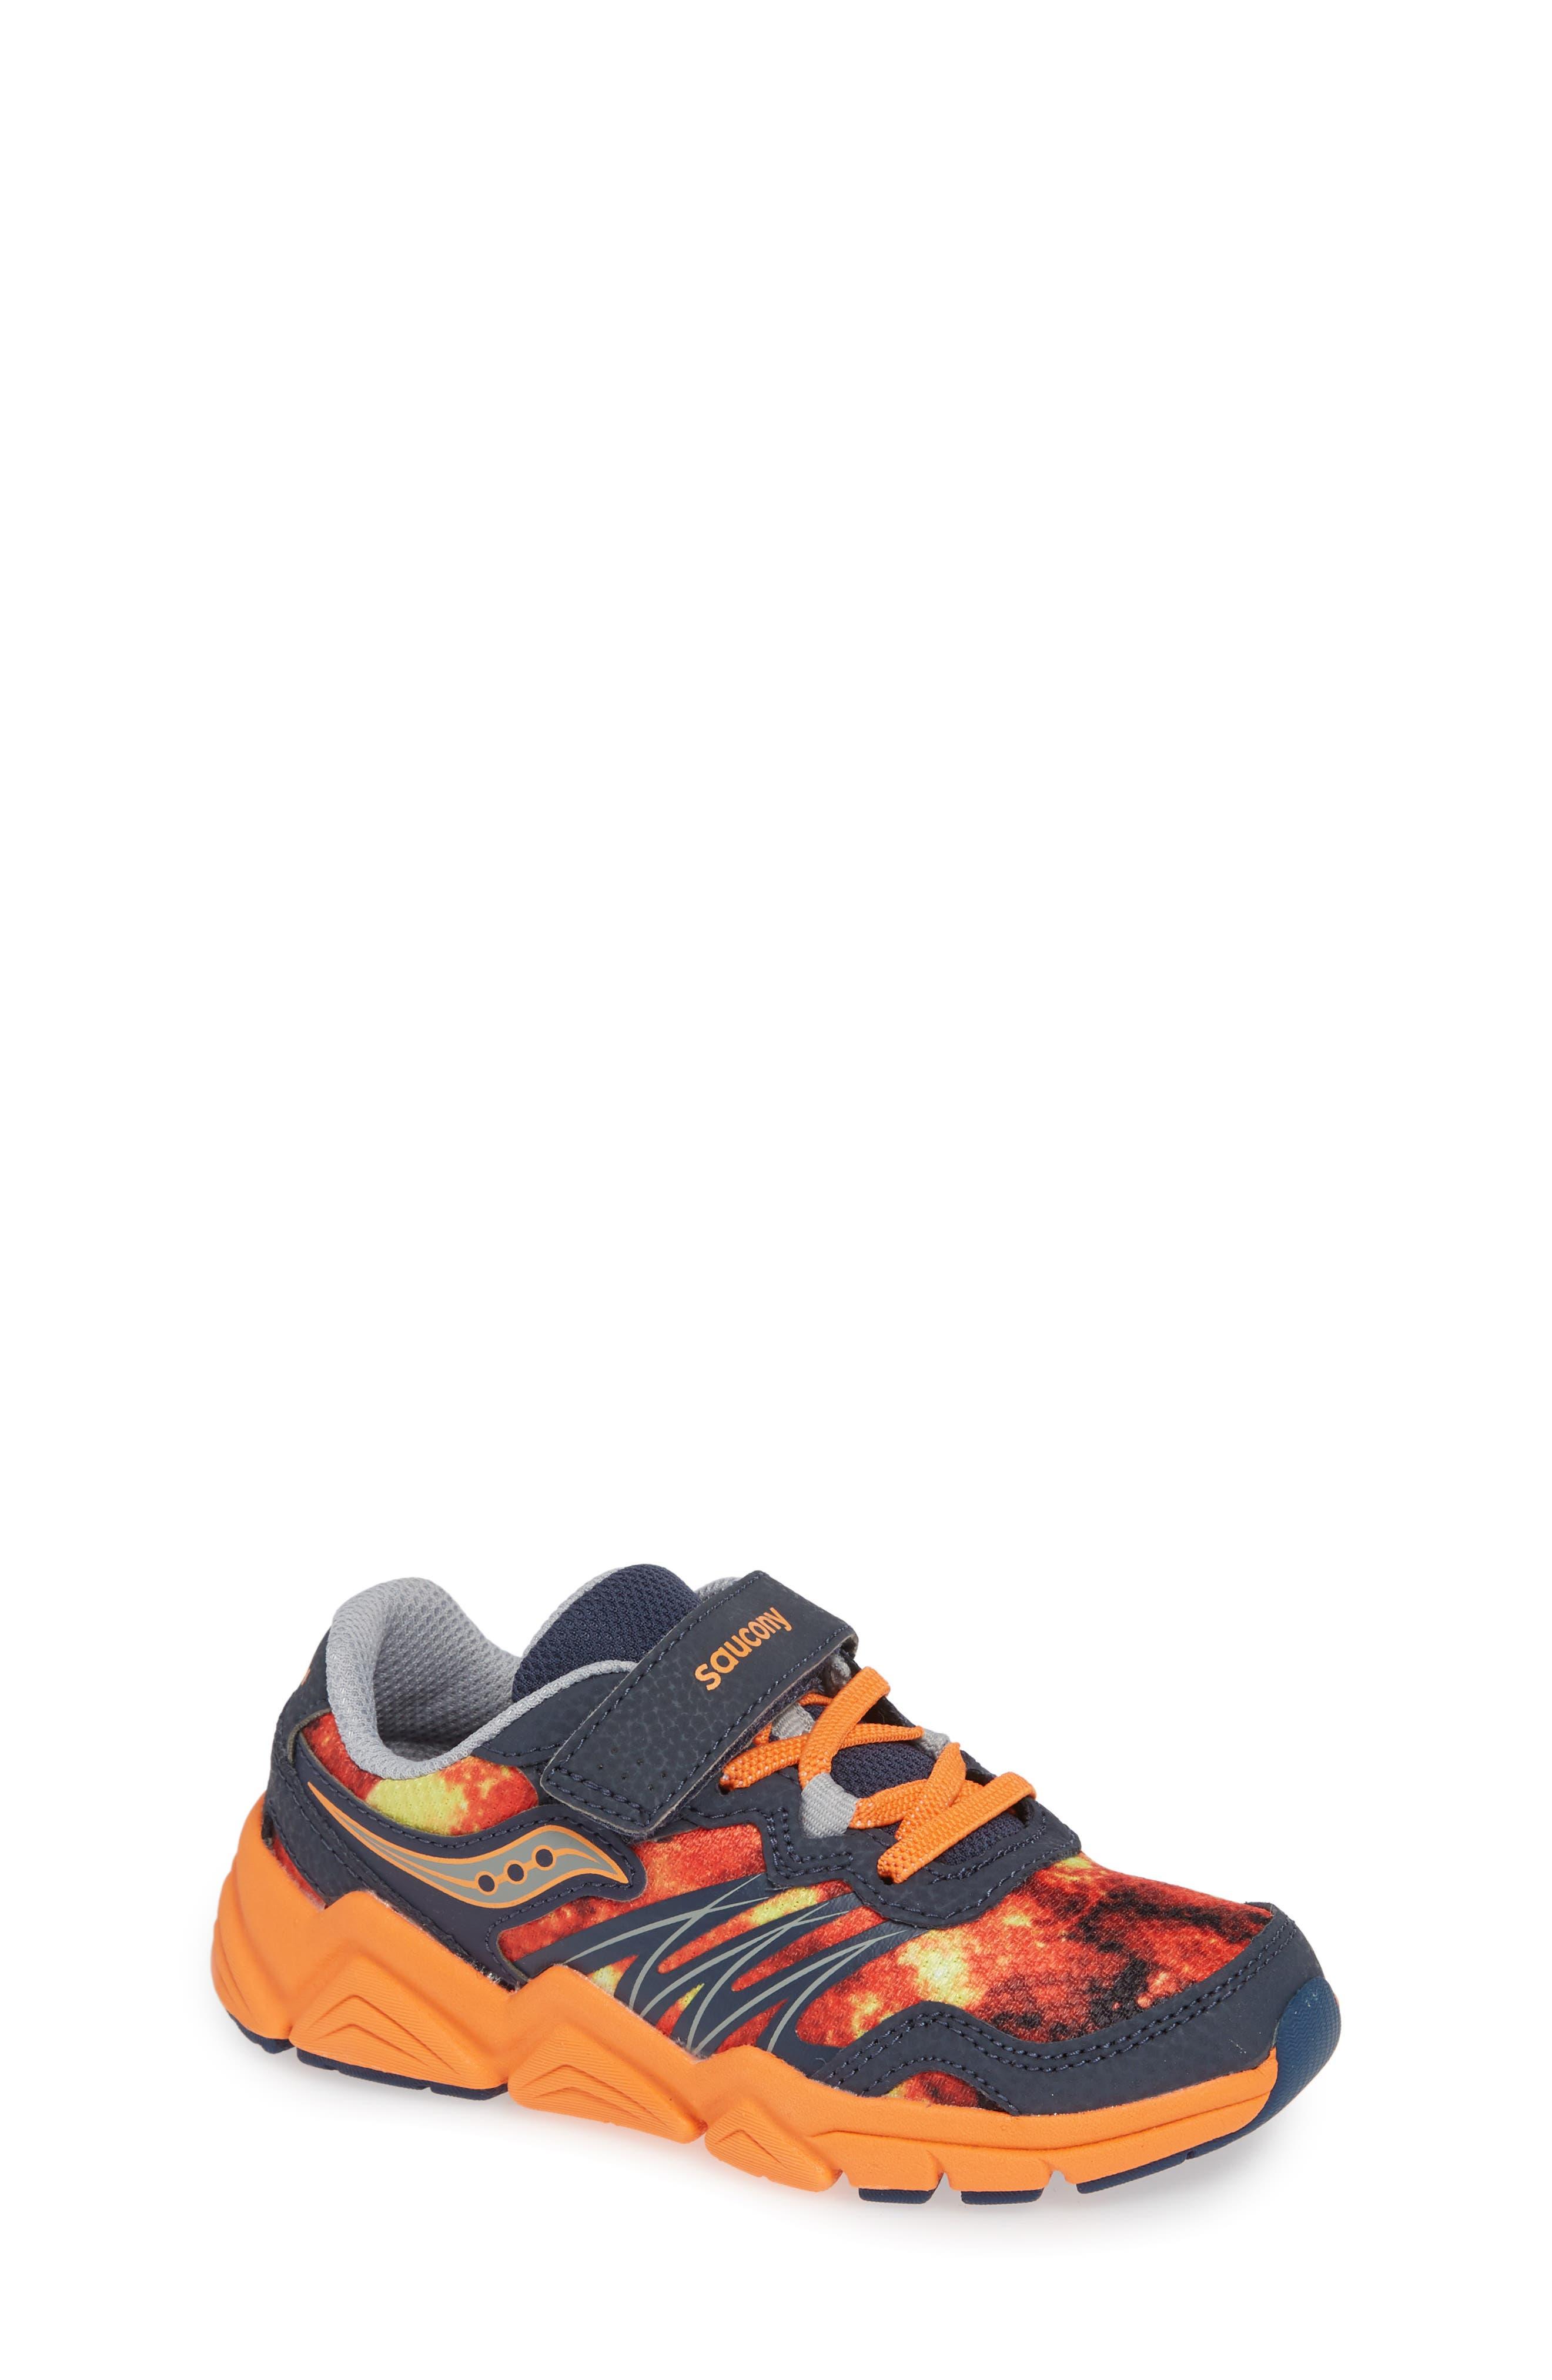 Boys Saucony Kotaro Flash Sneaker Size 15 M  Orange